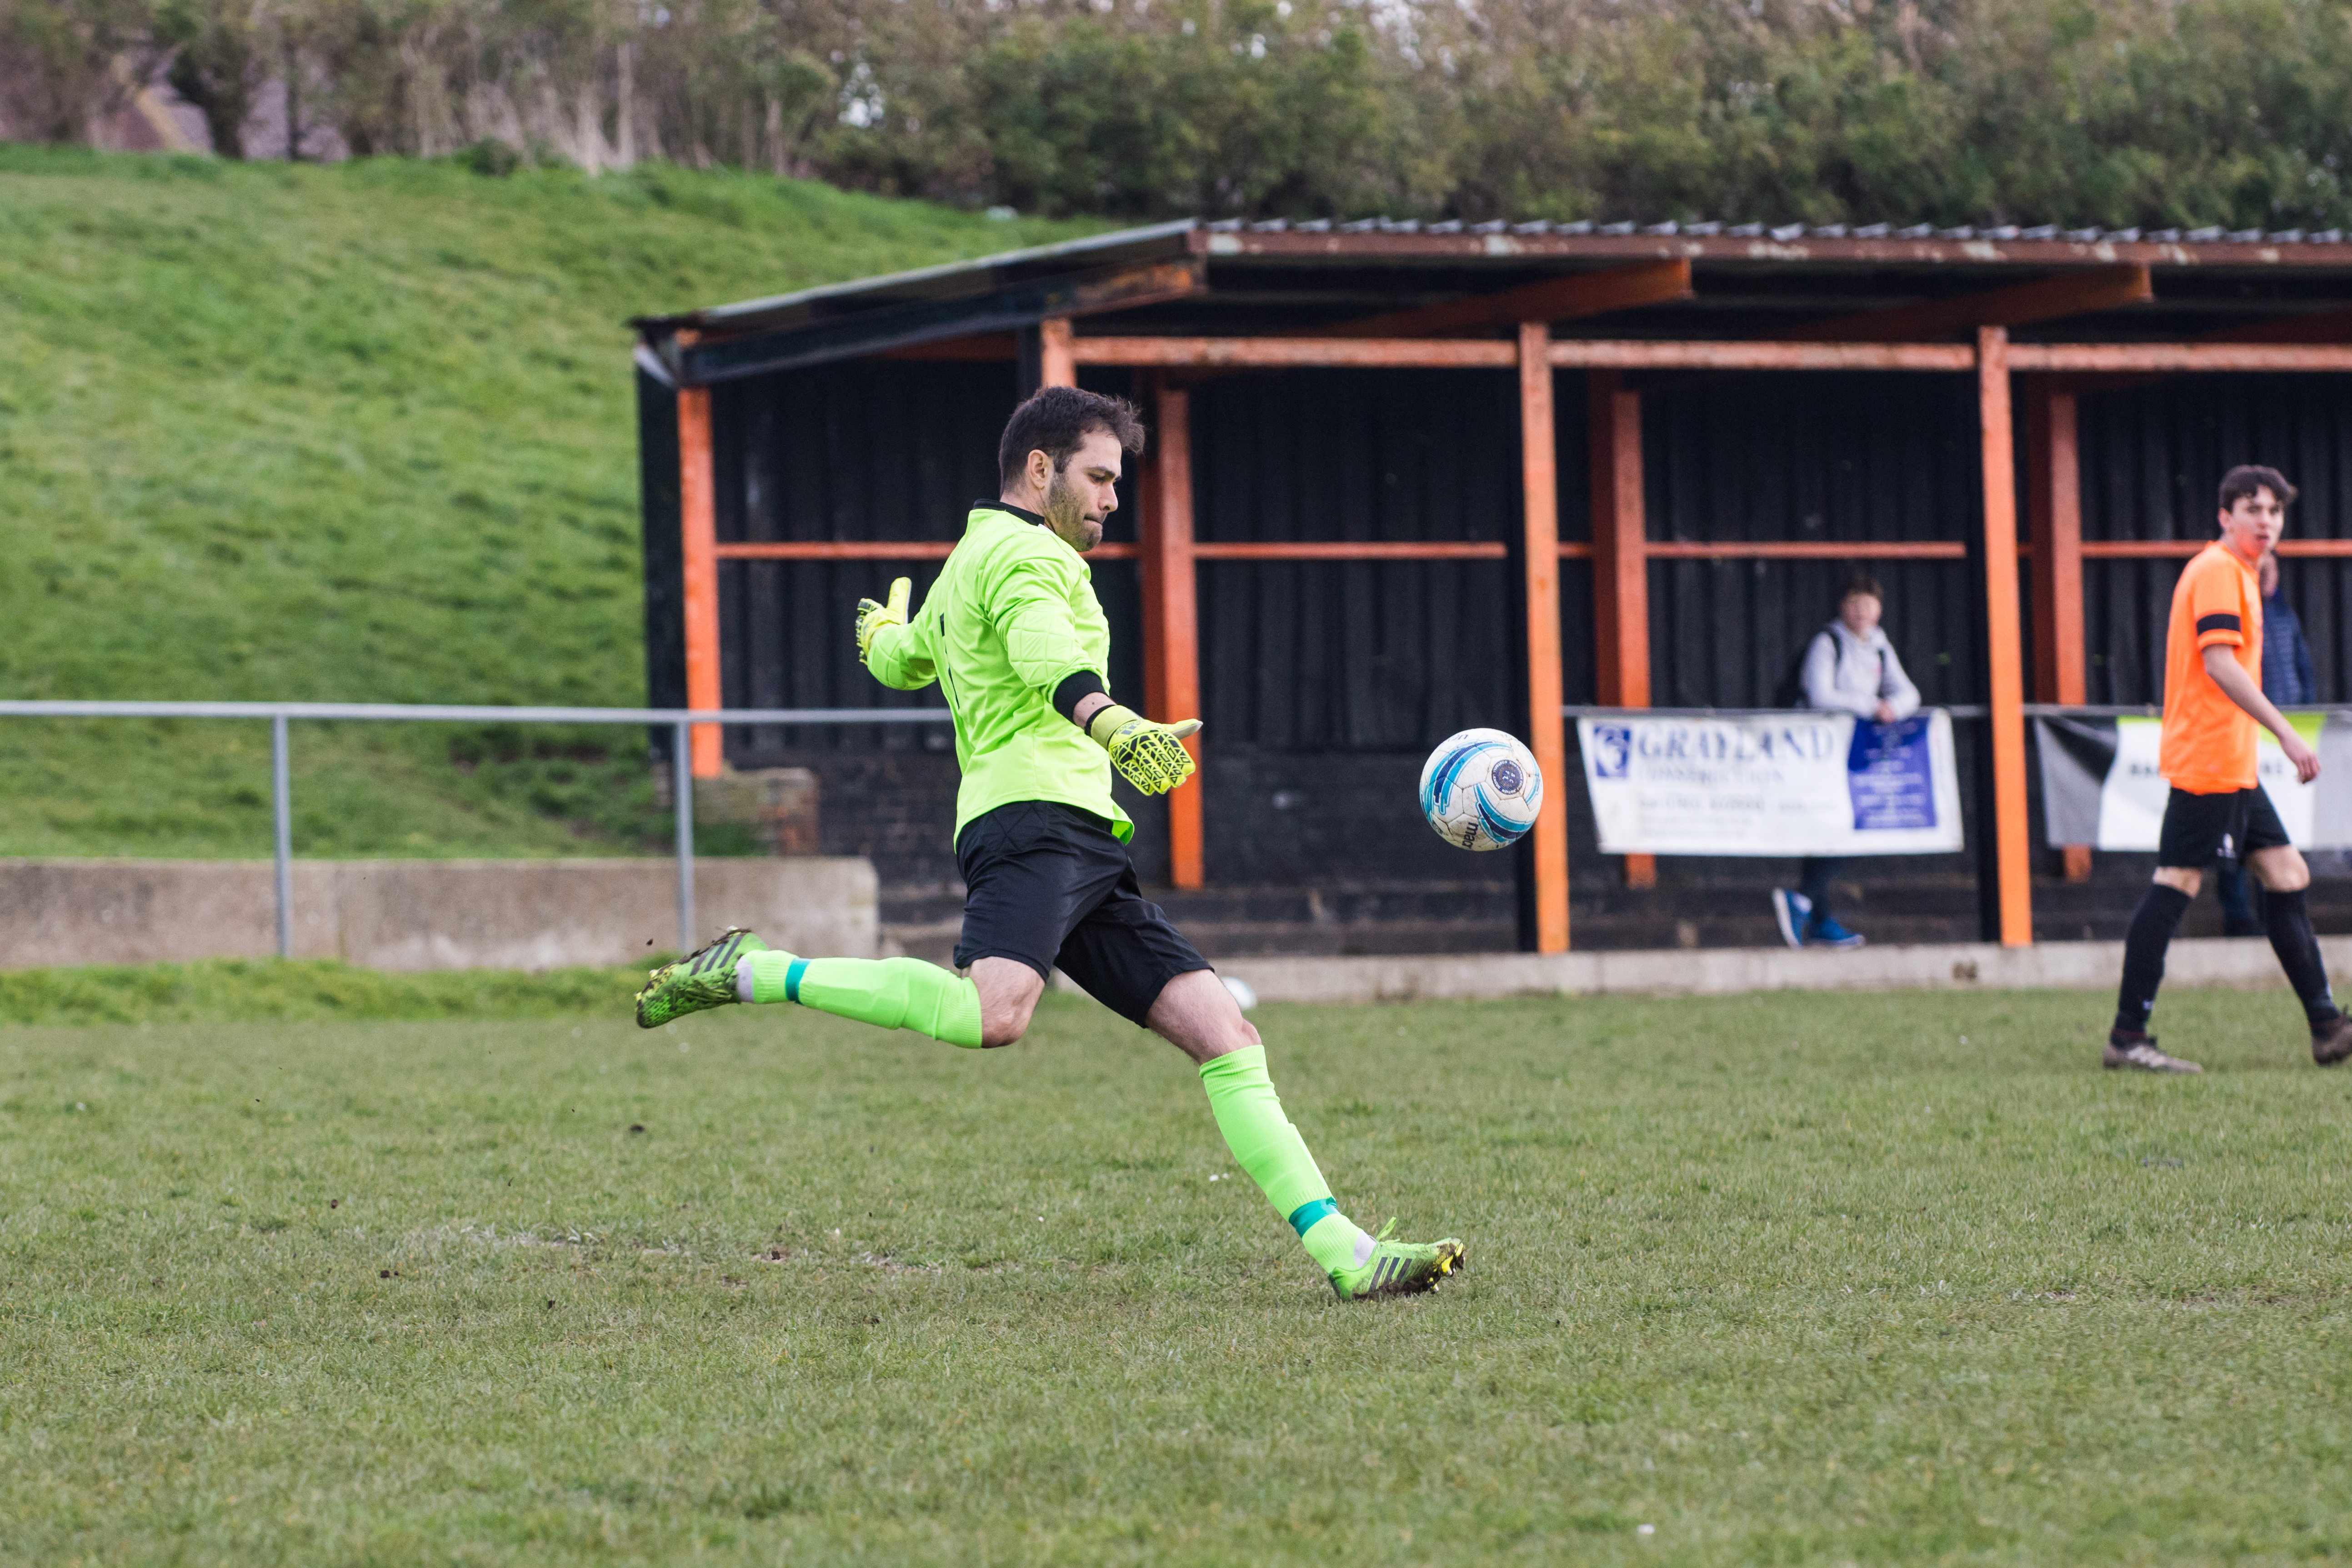 DAVID_JEFFERY Mile Oak FC vs Hailsham Town FC 24.03.18 12